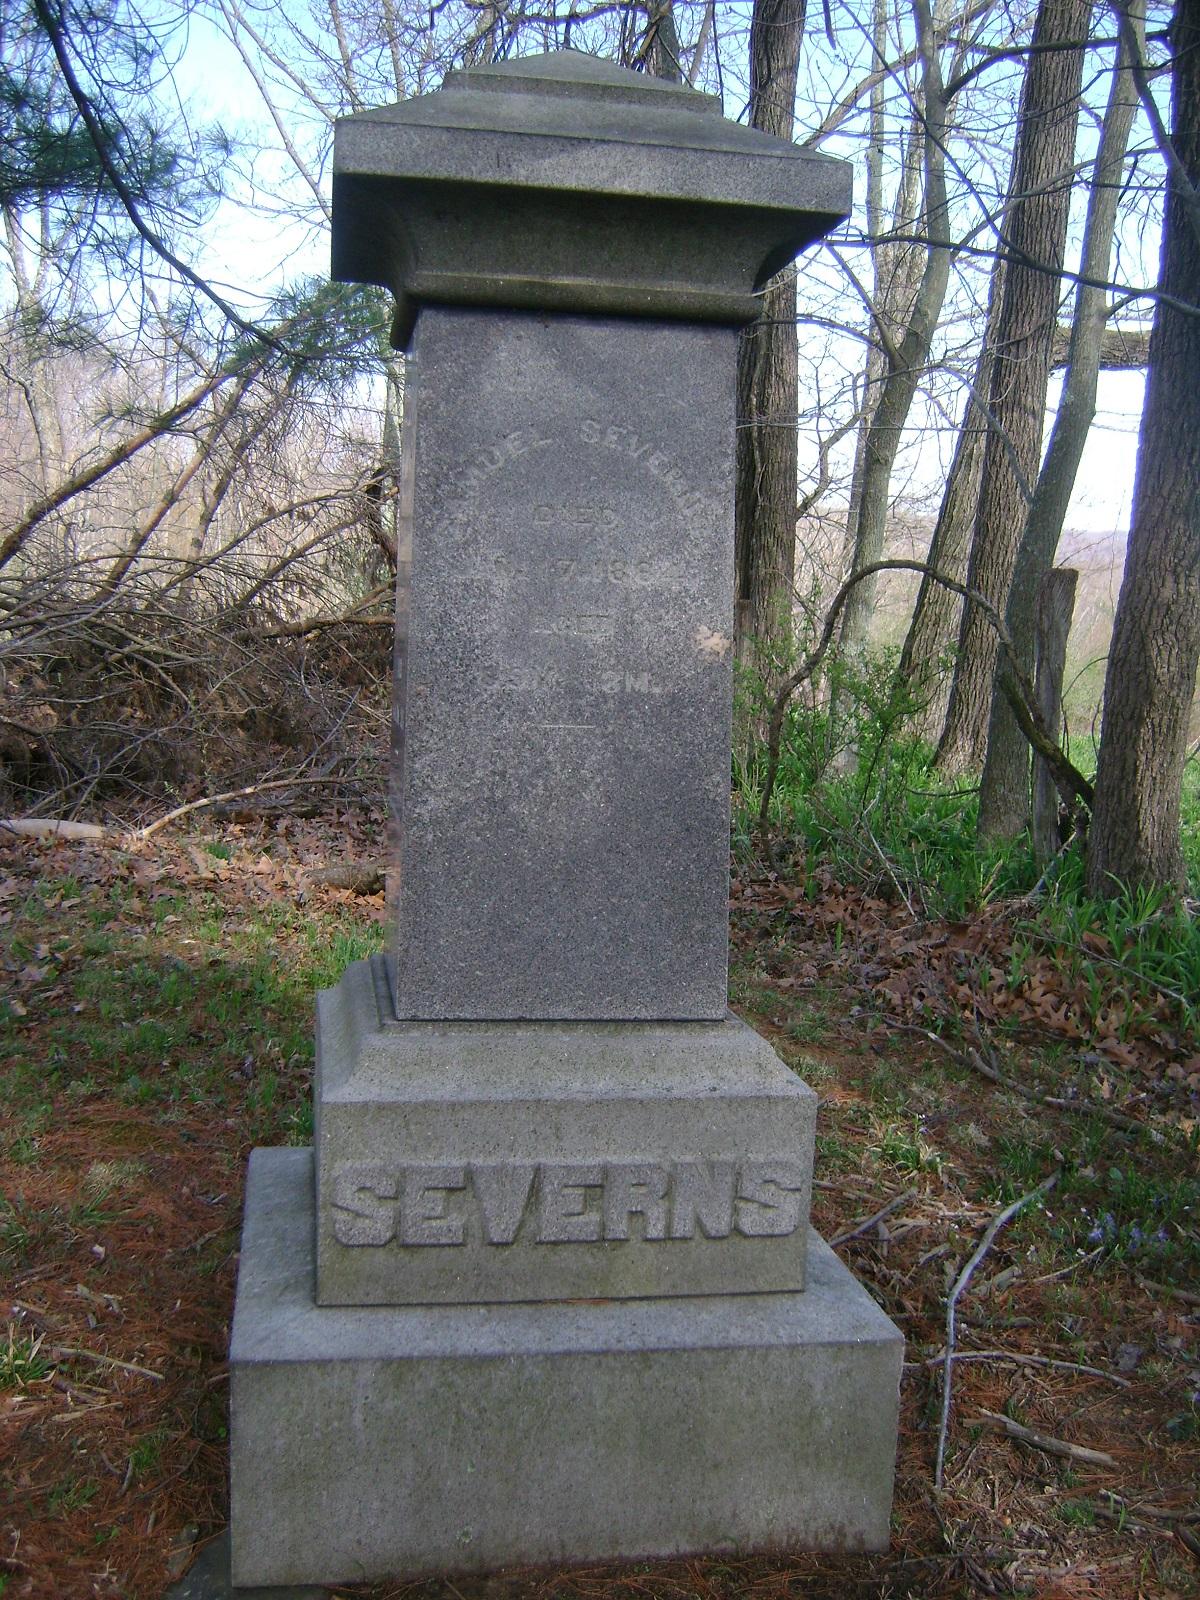 Abraham Severns